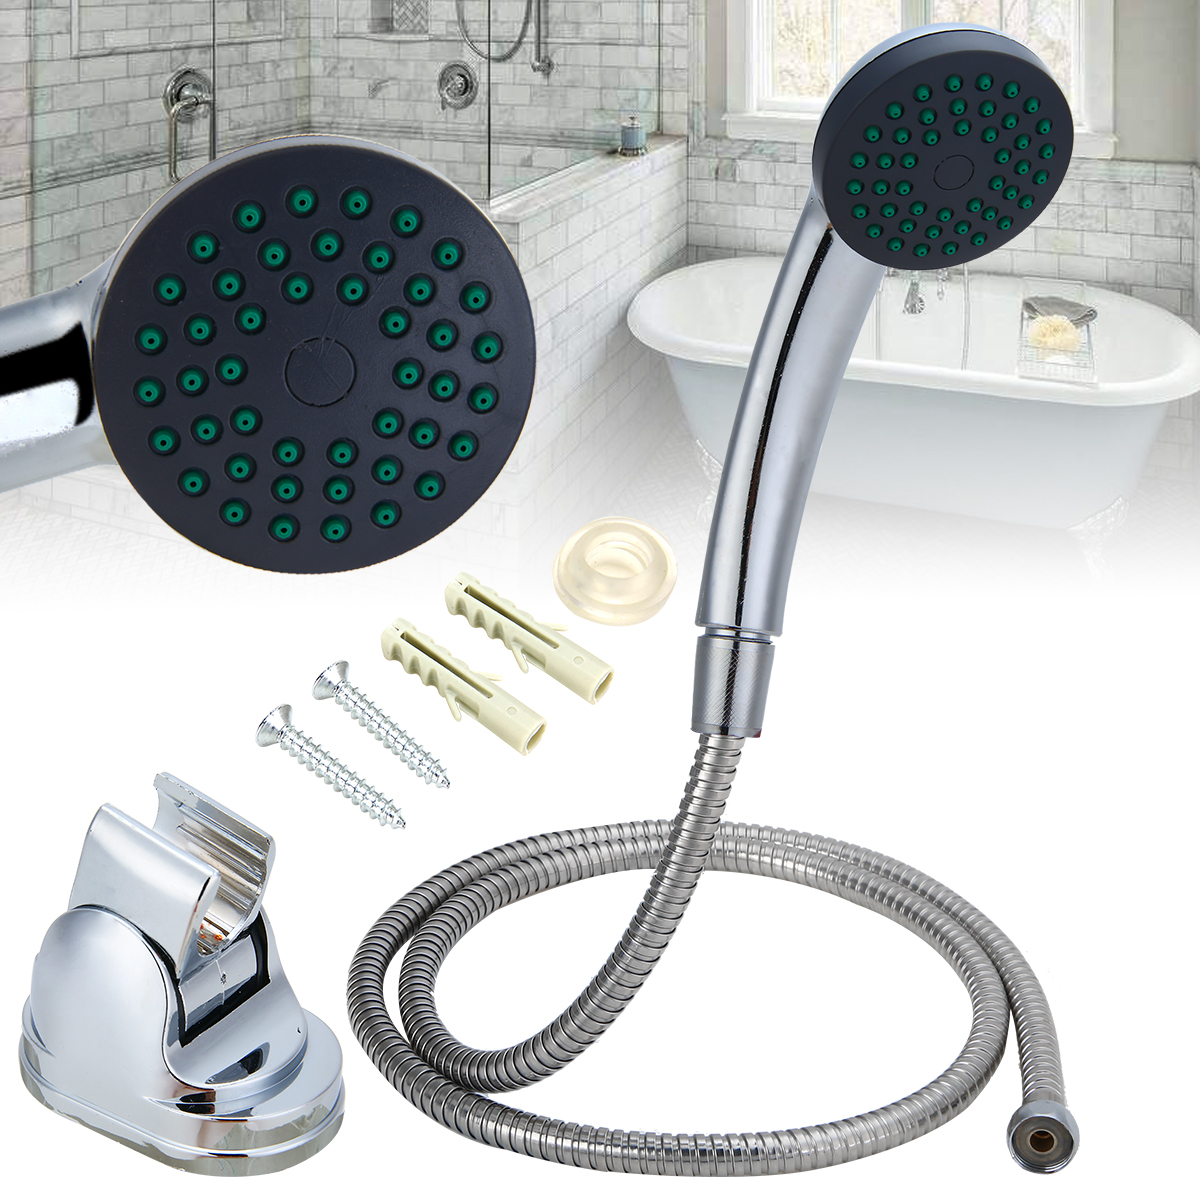 Us 7 68 30 Off 3pcs Shower Head Set Bathroom Handheld Spray Shower Head Bracket Flexible Horse Tool Set For Water Saving In Shower Heads From